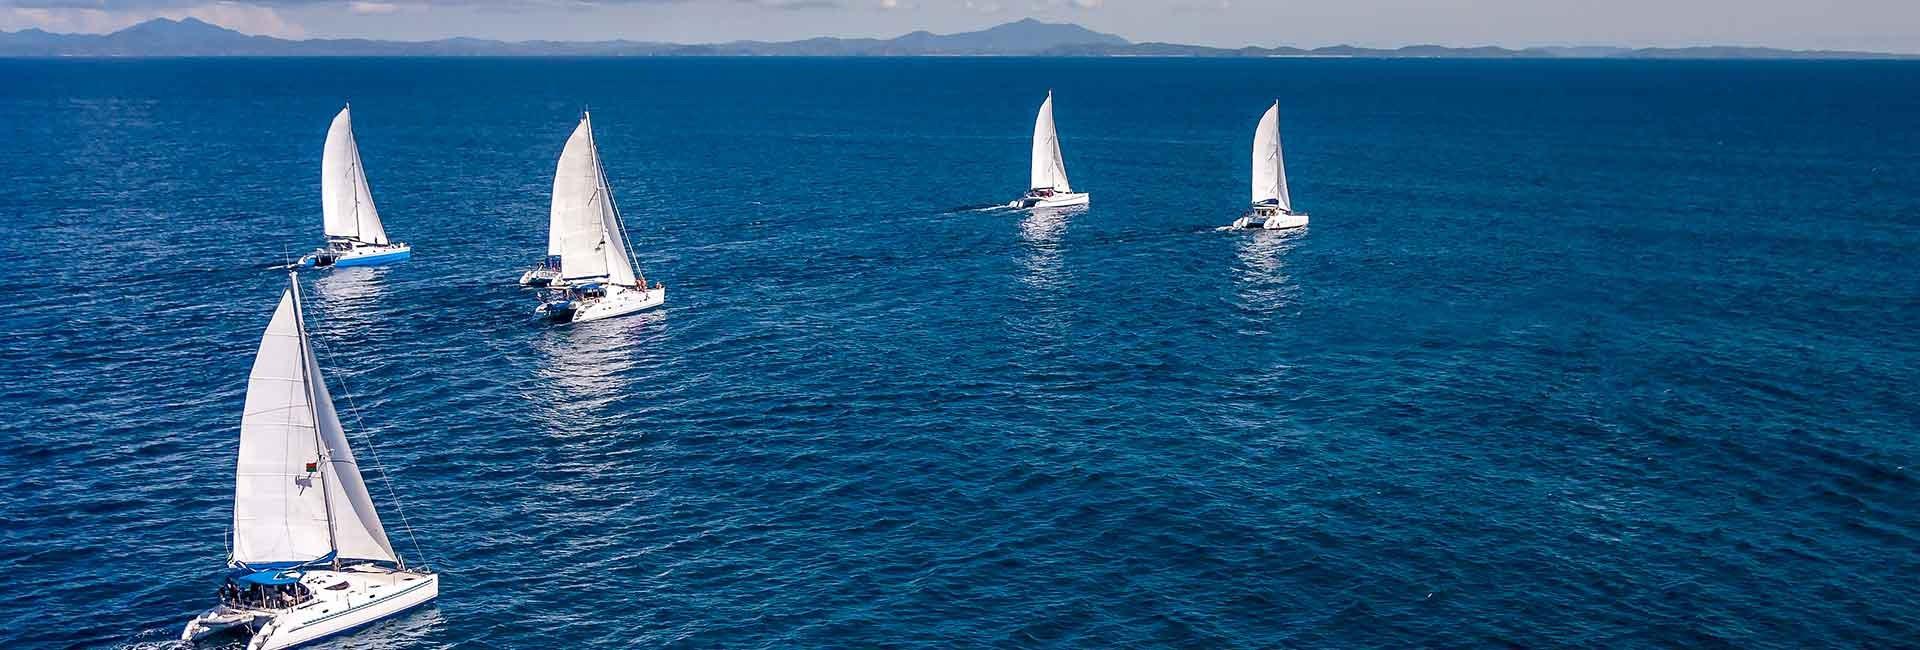 Yachts in the ocean